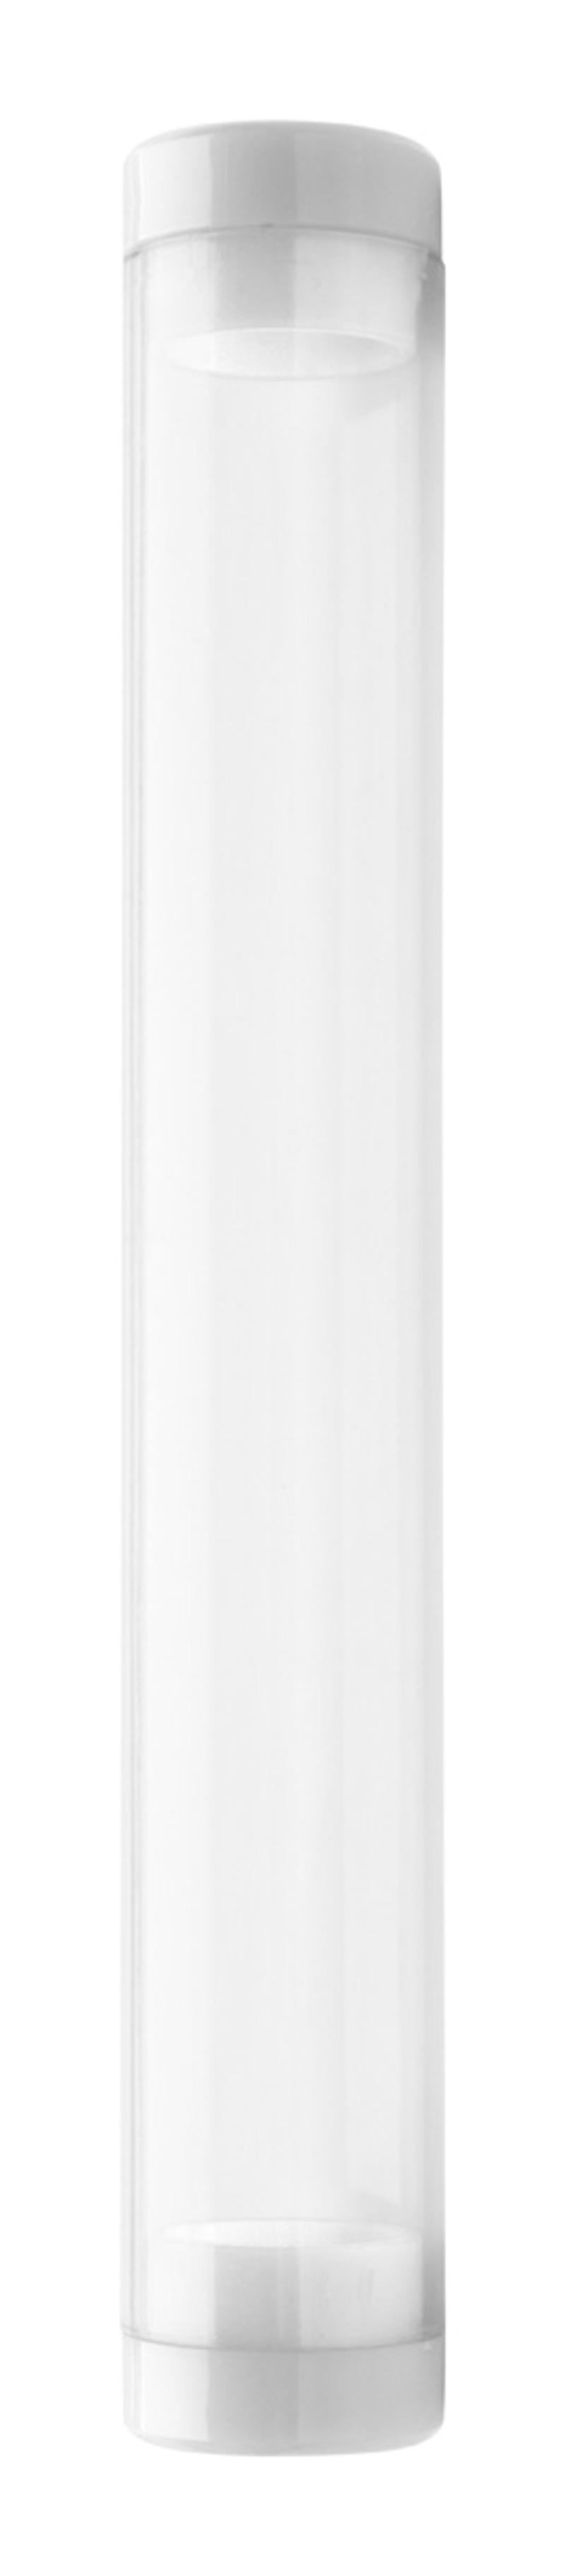 Crube tube pen case